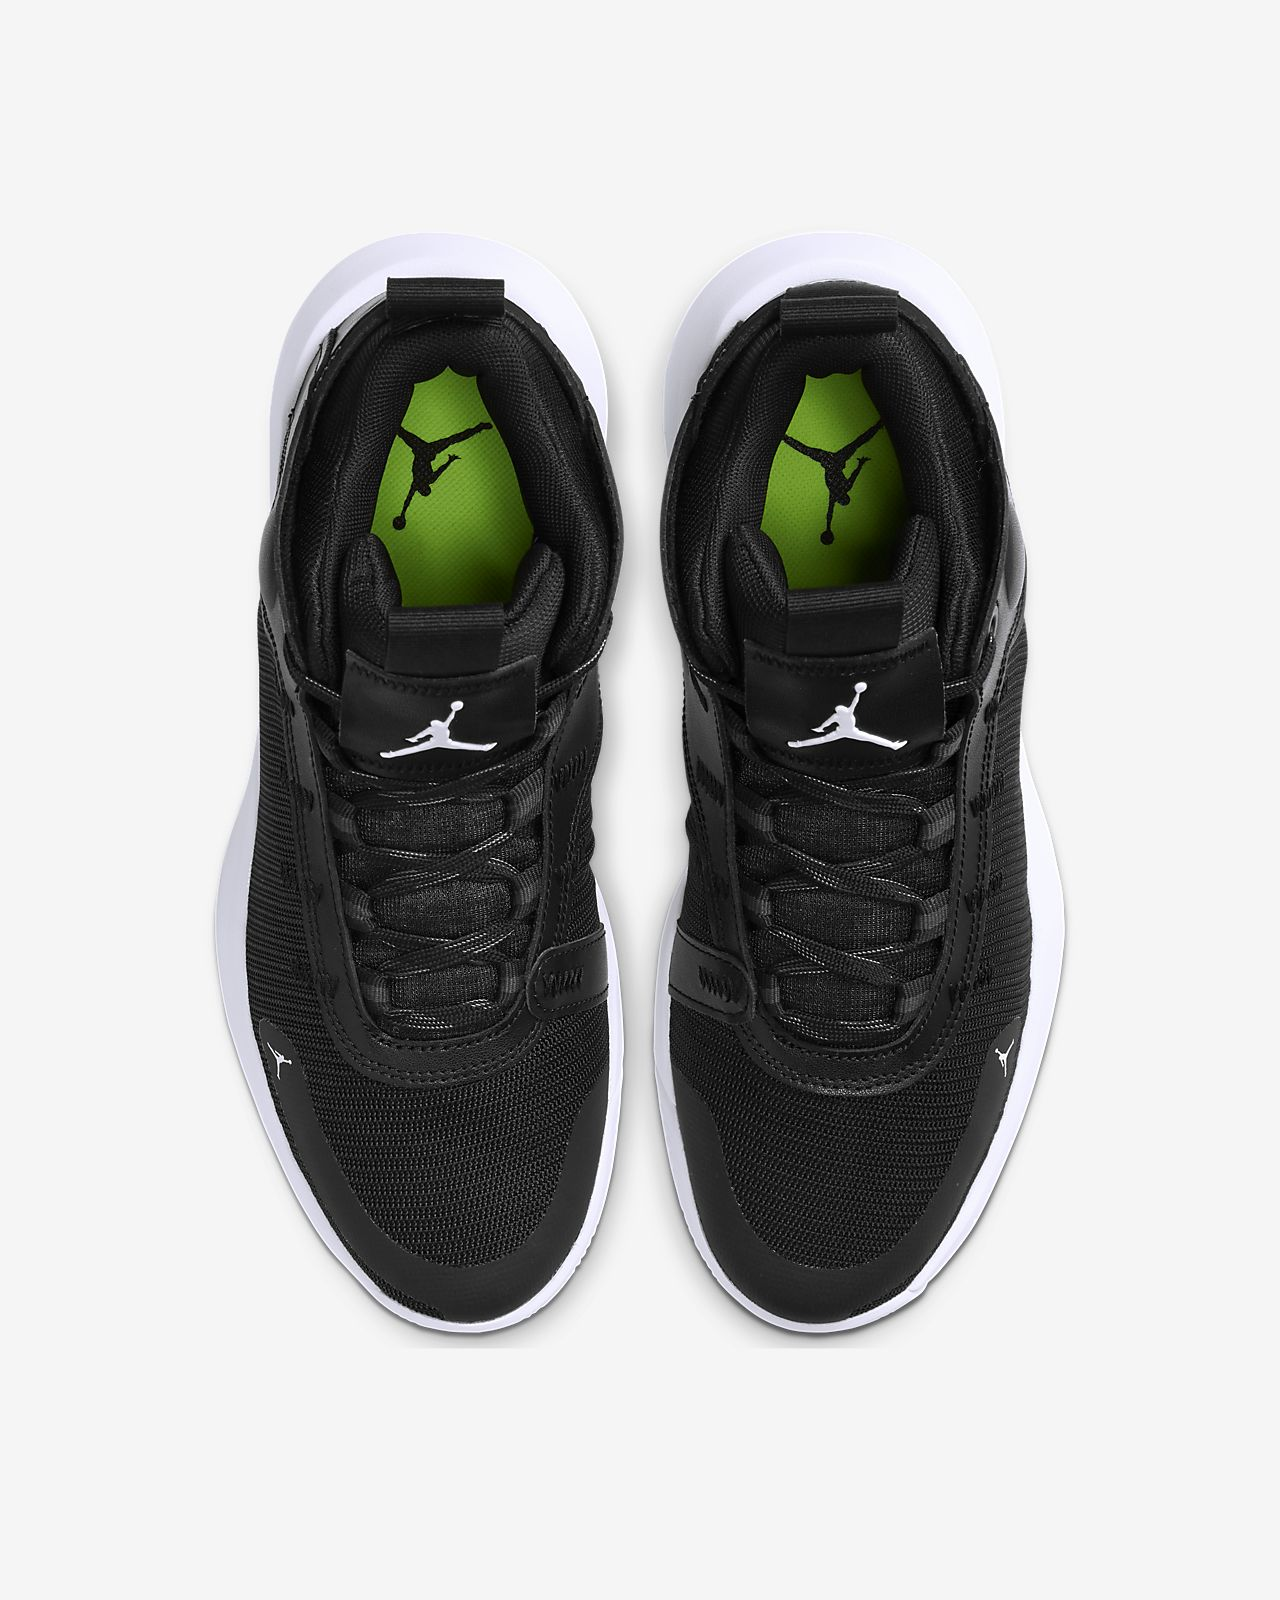 Calzado de básquetbol para hombre Jordan Jumpman 2020